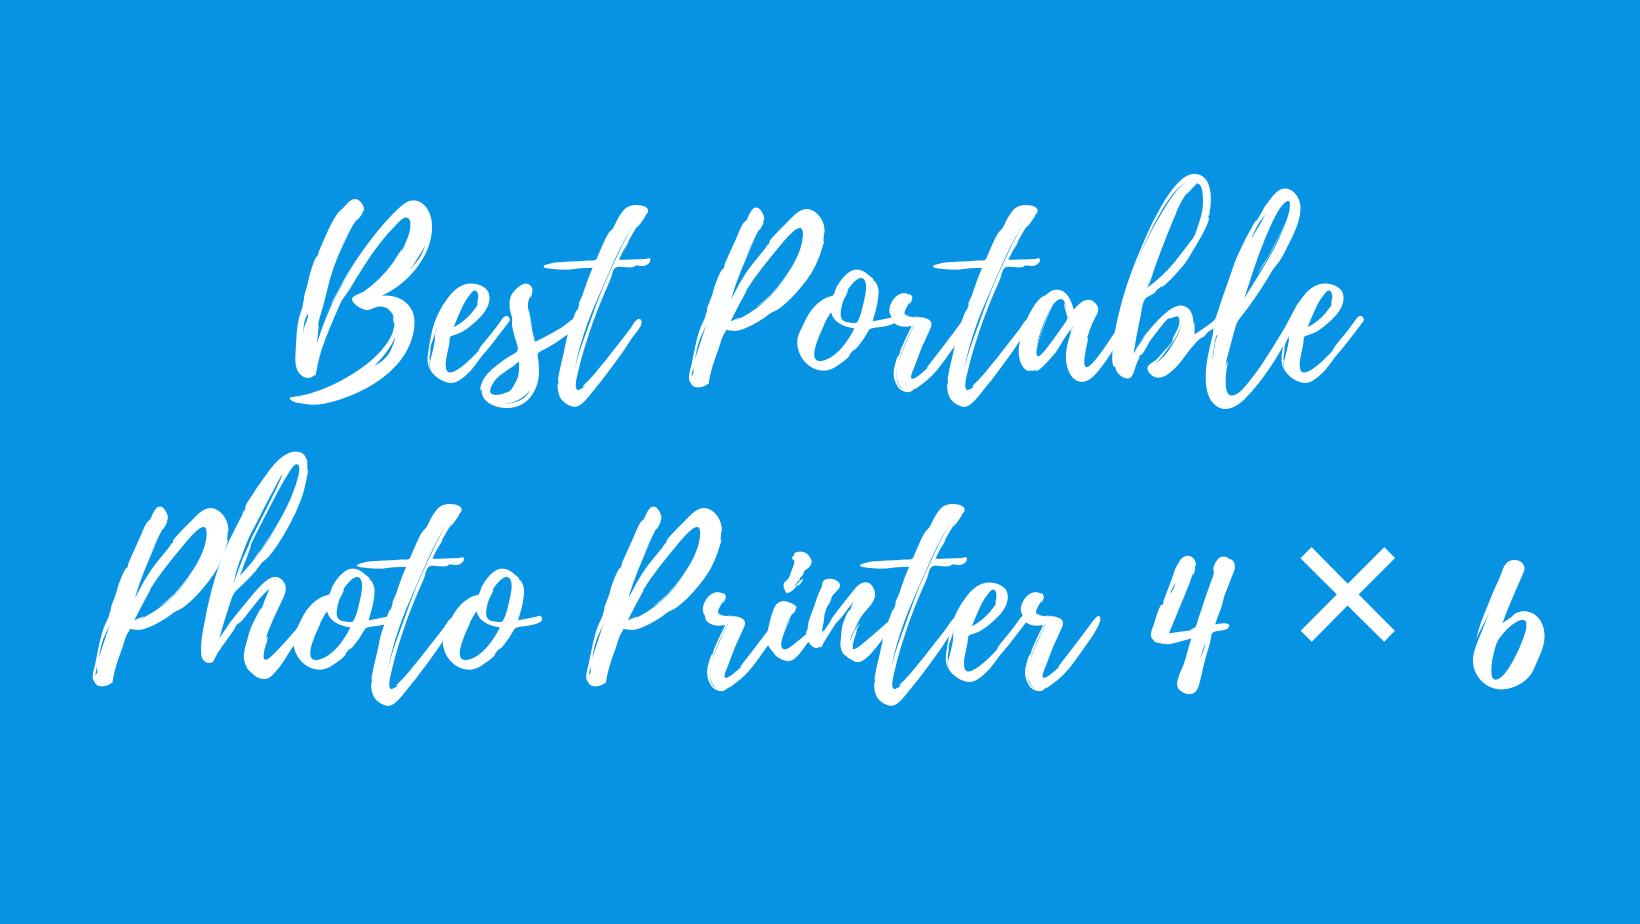 best portable photo printer 4 x 6